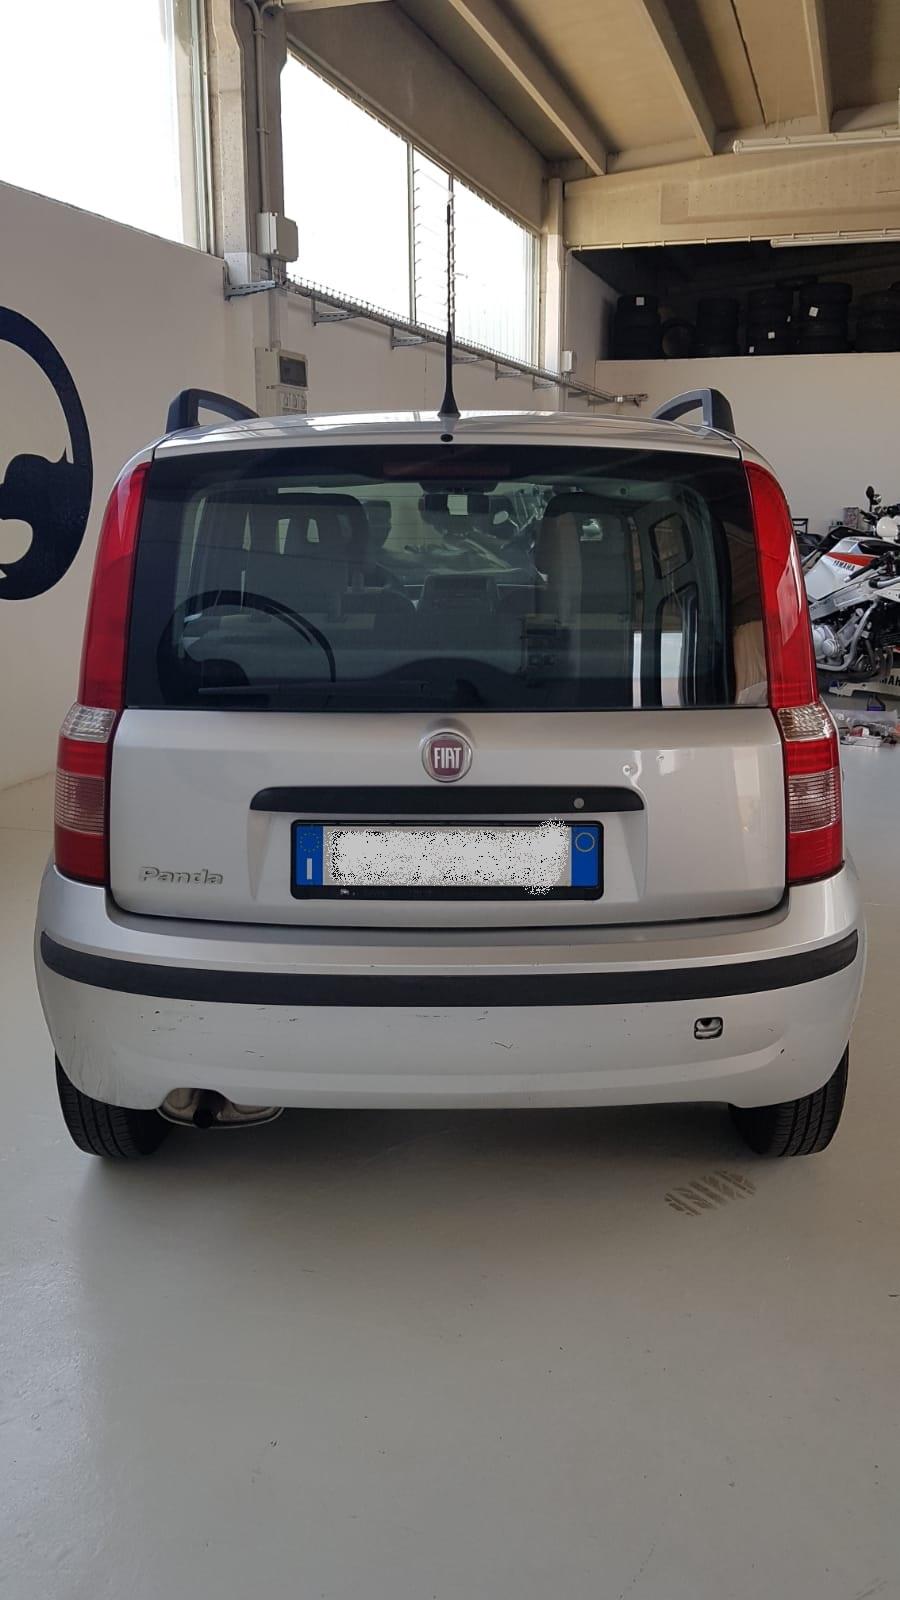 Fiat Panda 1.2 GPL 7